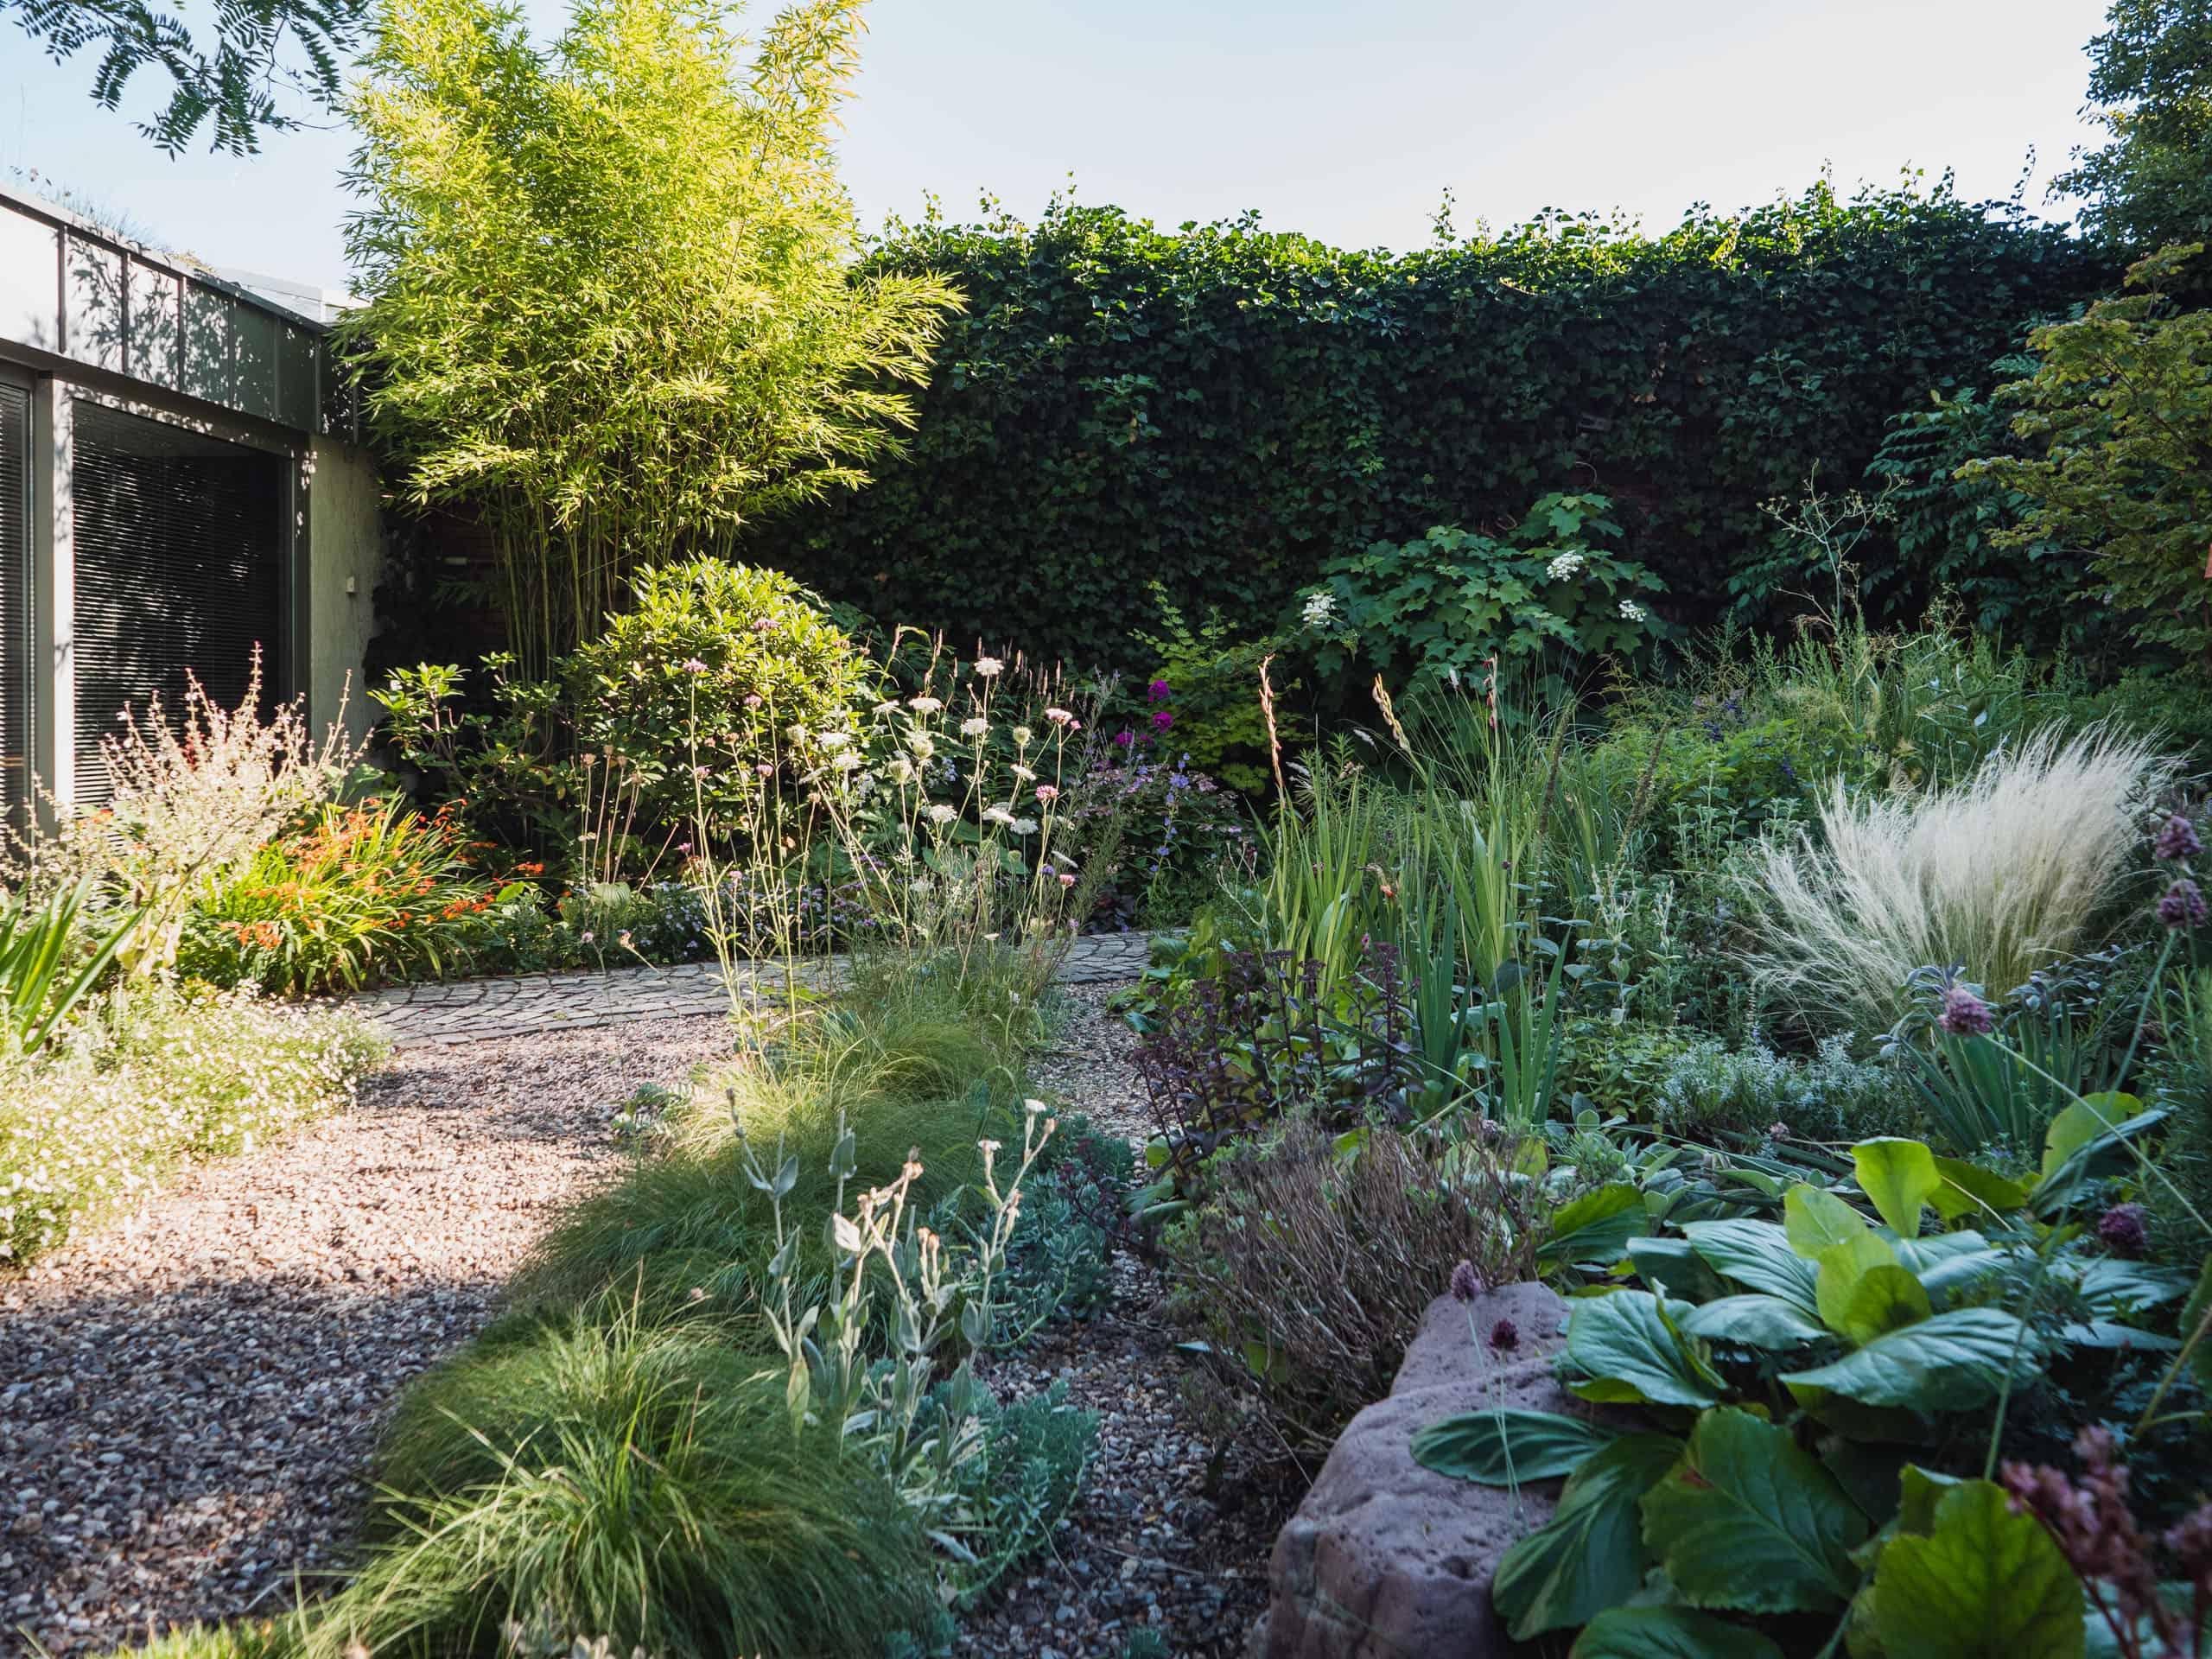 Sibylles Garden